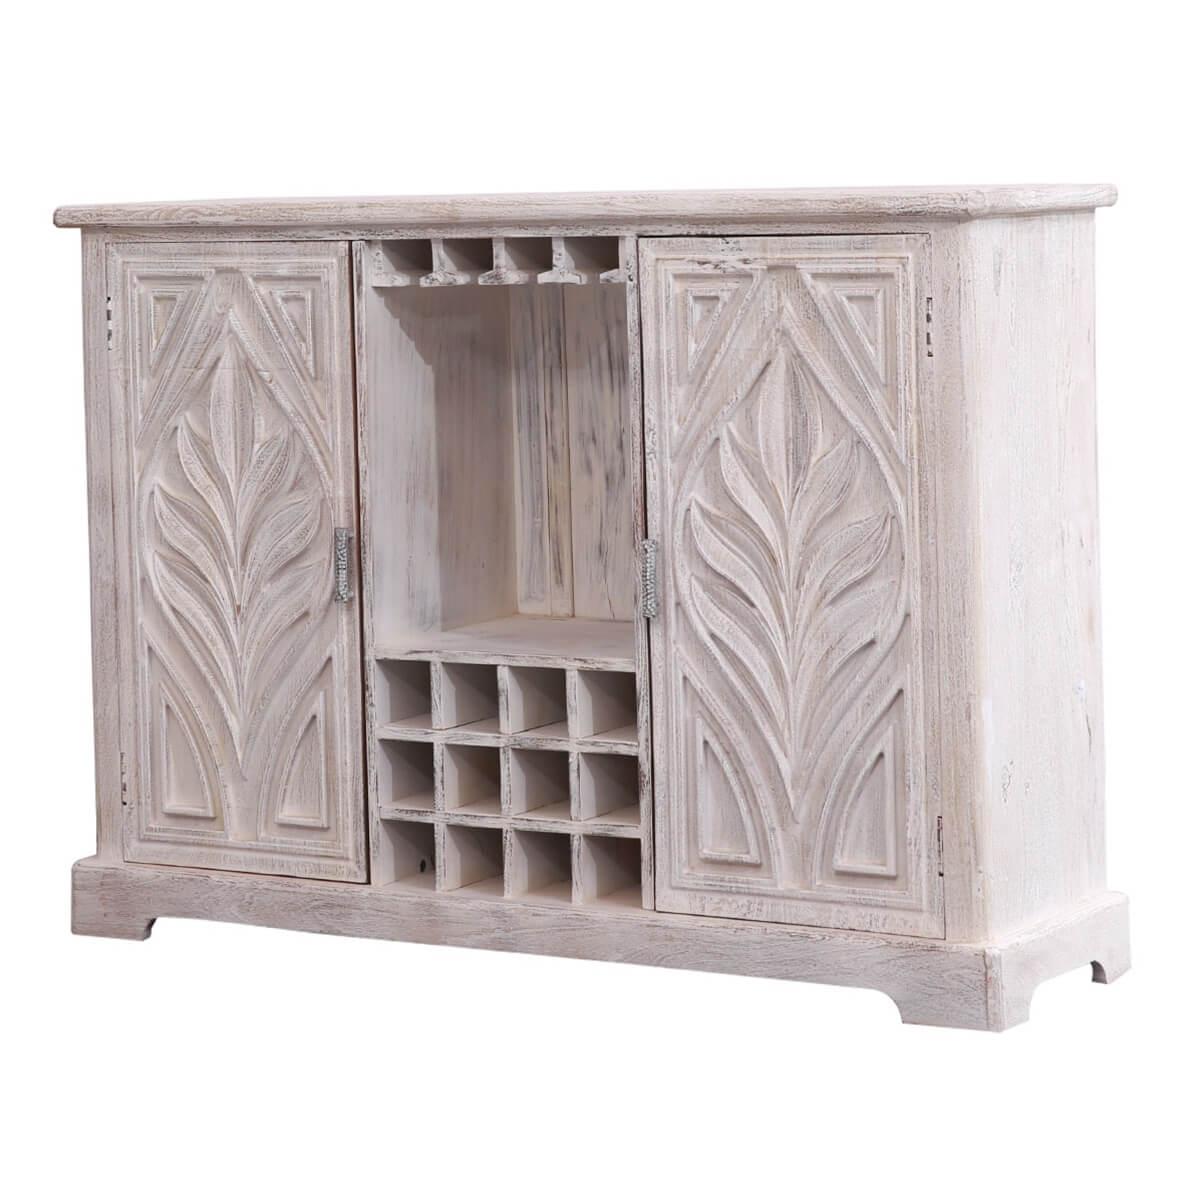 Allerdale Farmhouse Rustic Solid Wood Door Bar Sideboard Cabinet